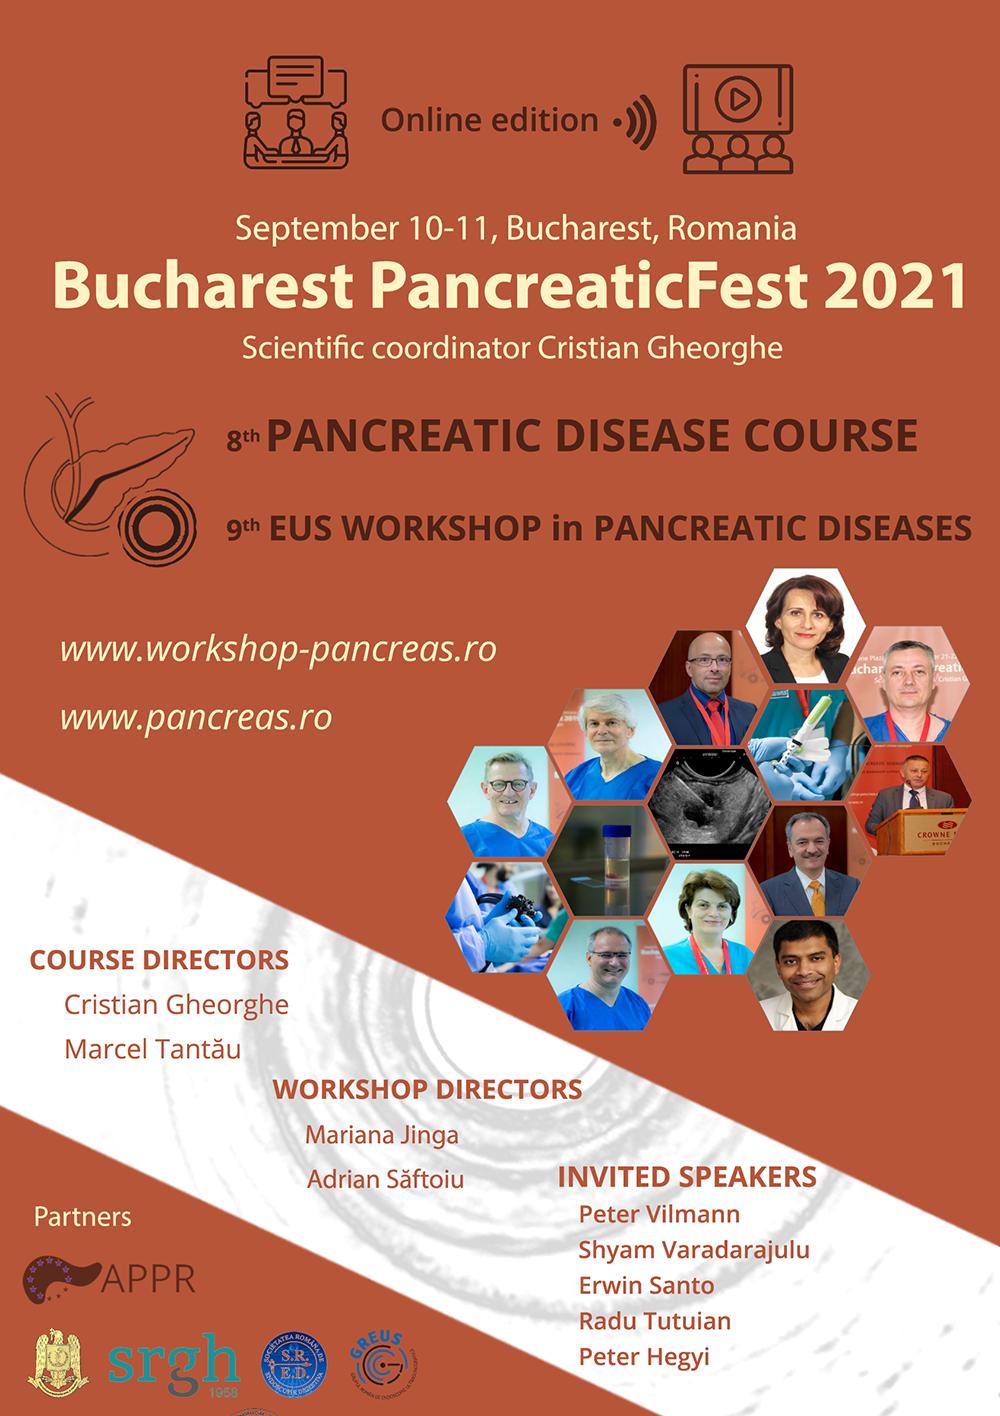 Bucharest pancreatic fest 2021